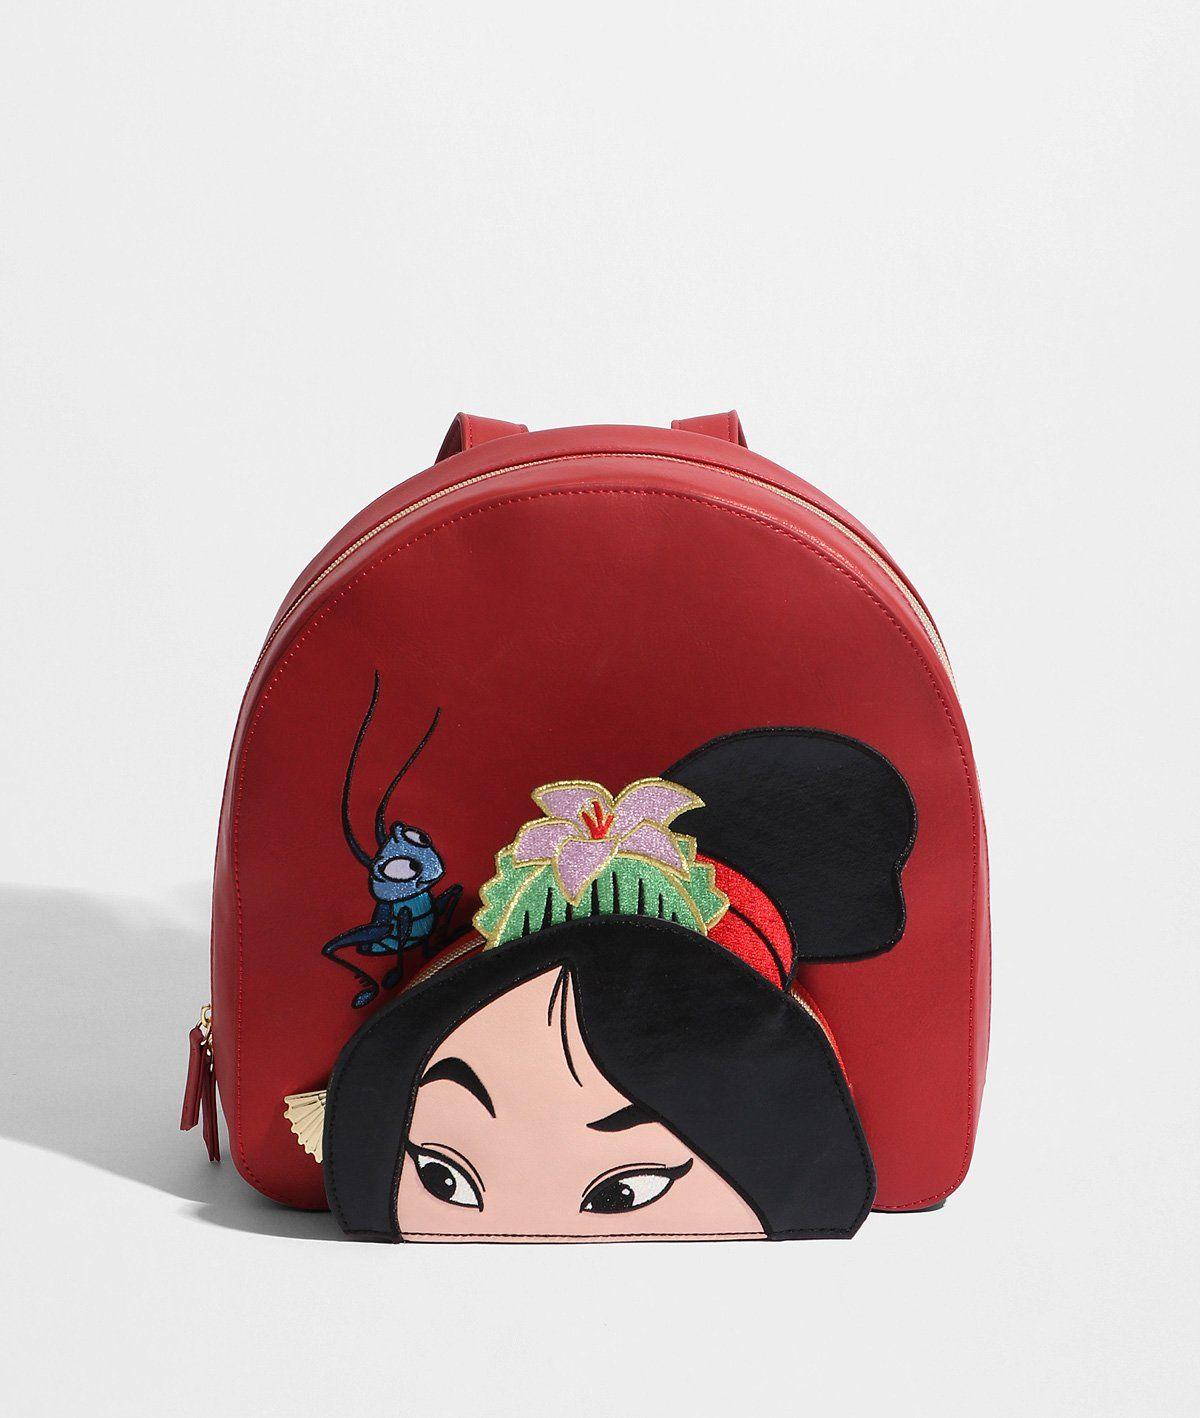 dcf14a64a00 Mulan Backpack. Danielle Nicole ...